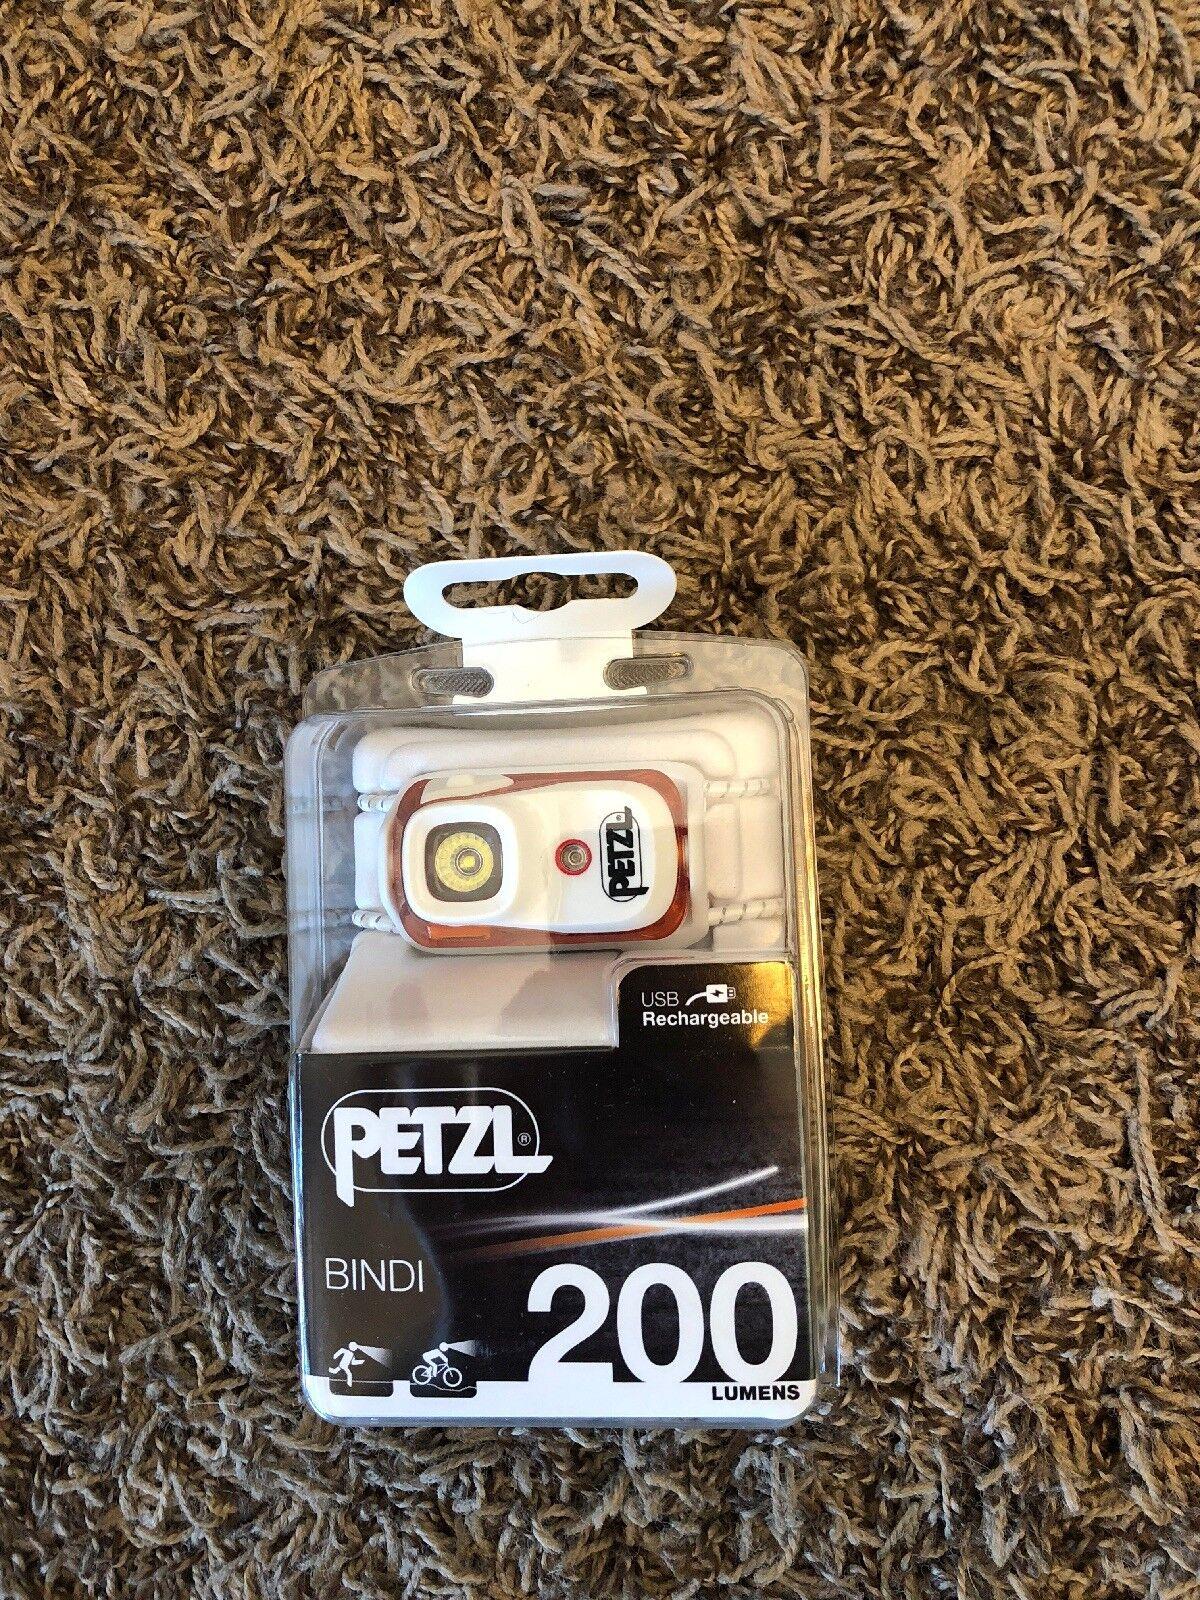 Petzl Bindi Active Headlamp 200 Lumens Orange USB Rechargeable Brand New